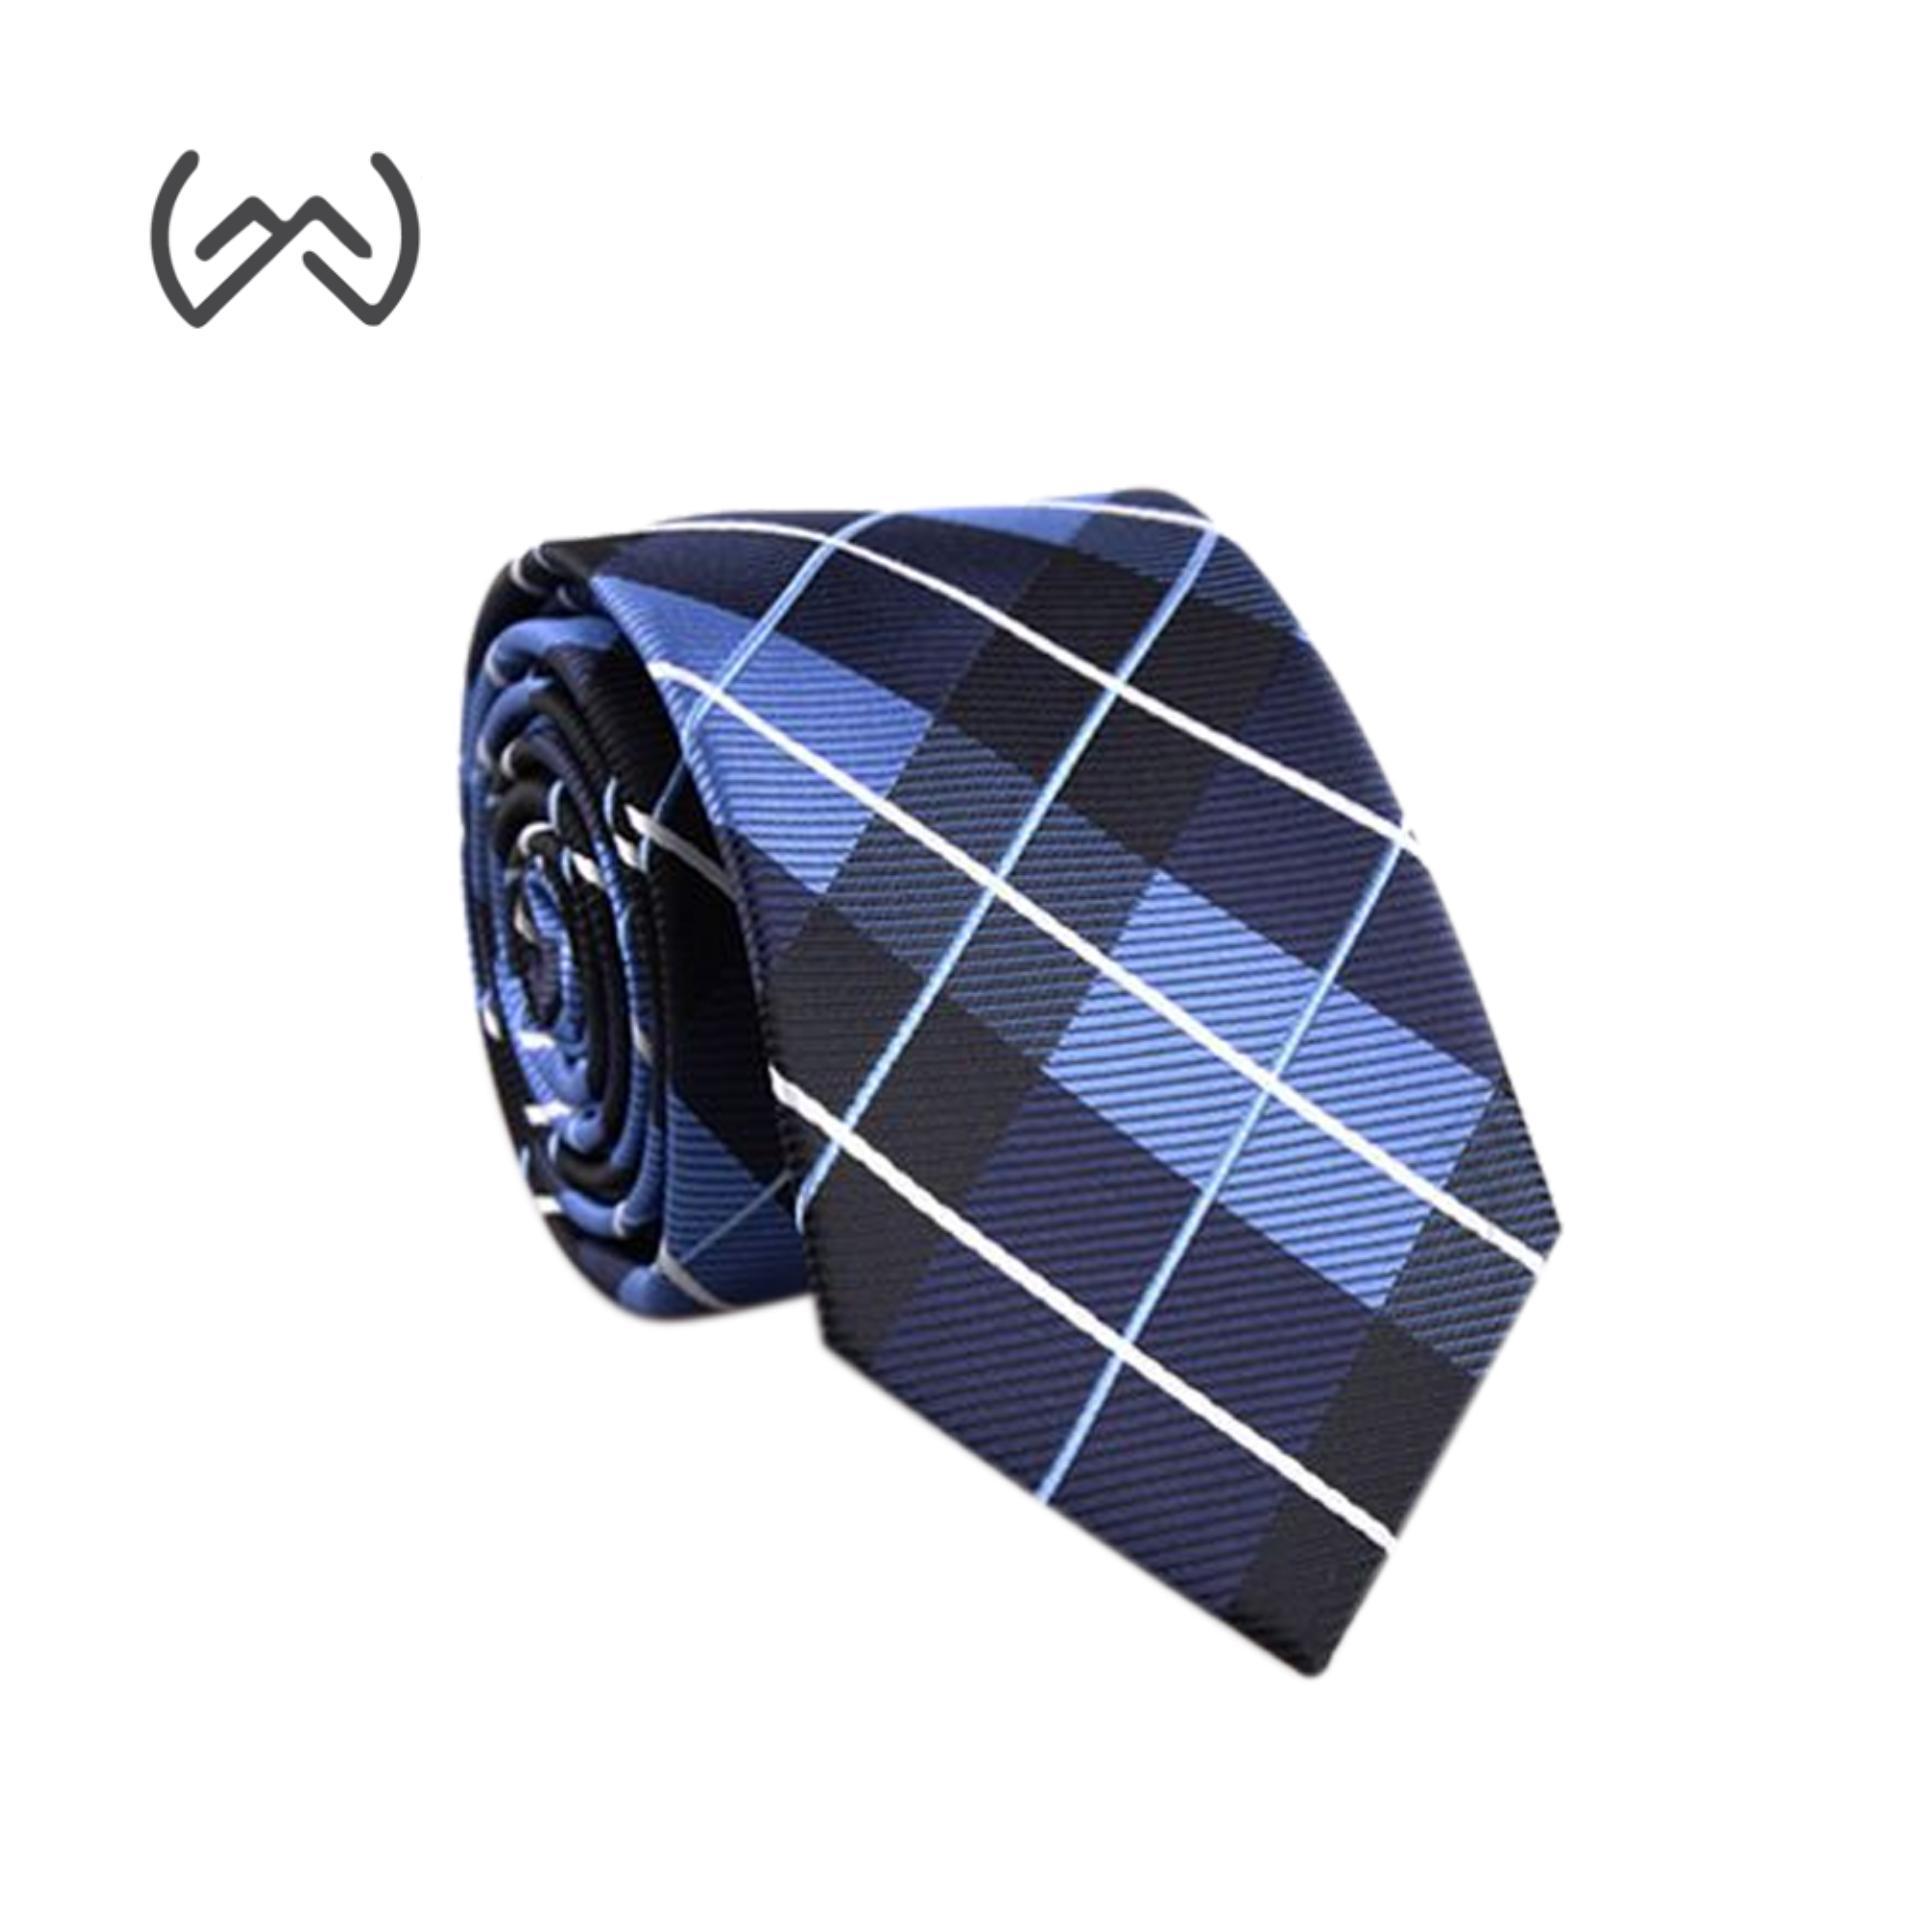 7f921baed4e10 Neckties for sale - Mens Neck Ties Online Deals & Prices in ...